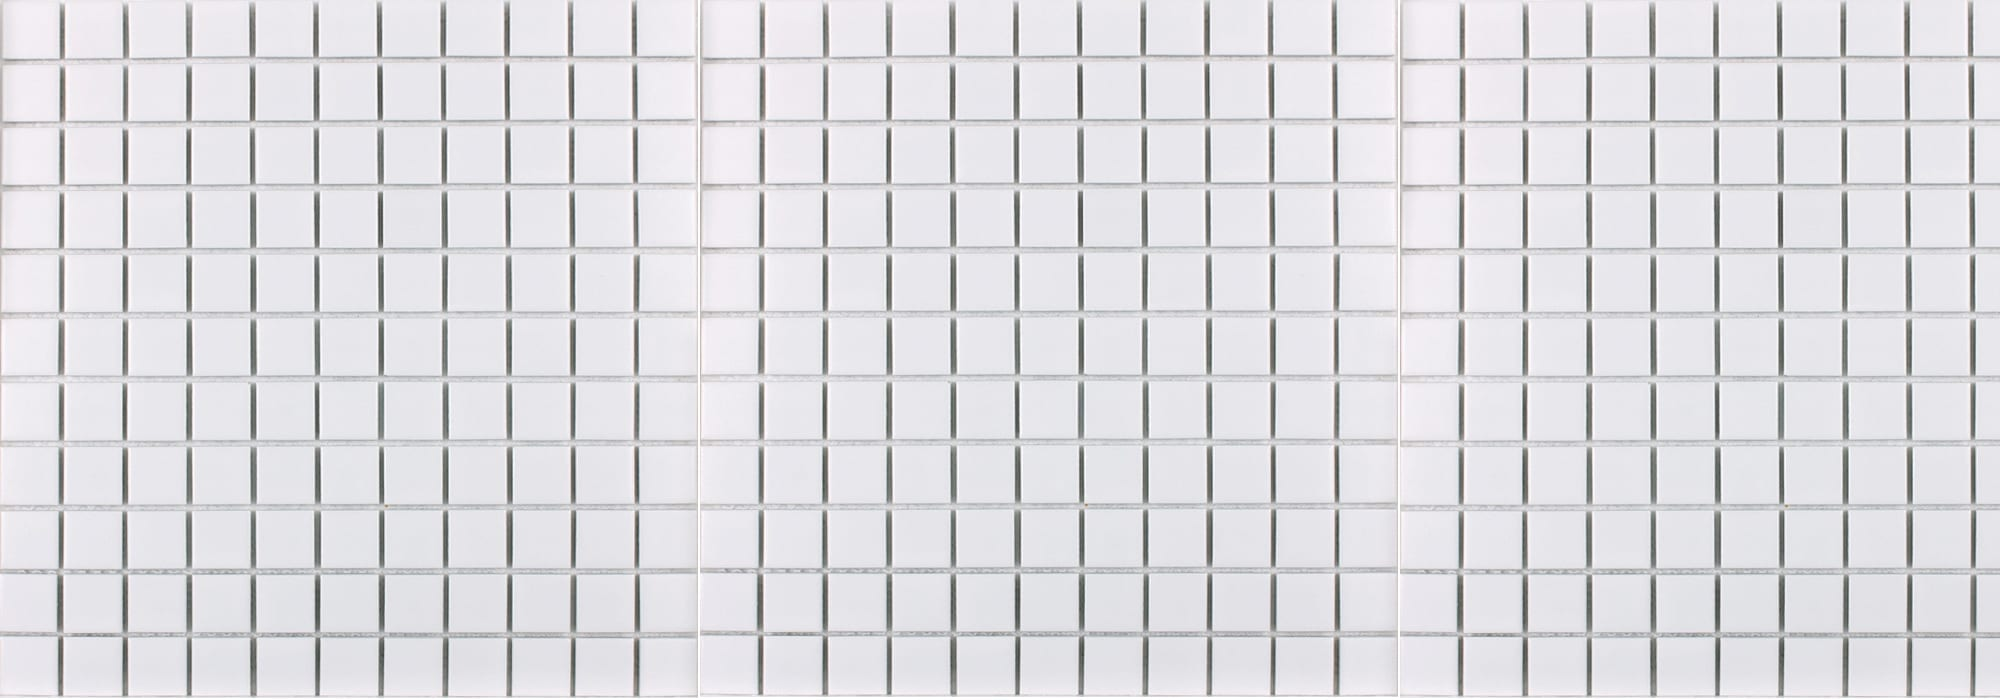 פסיפס פורצלן לבן by Milstone